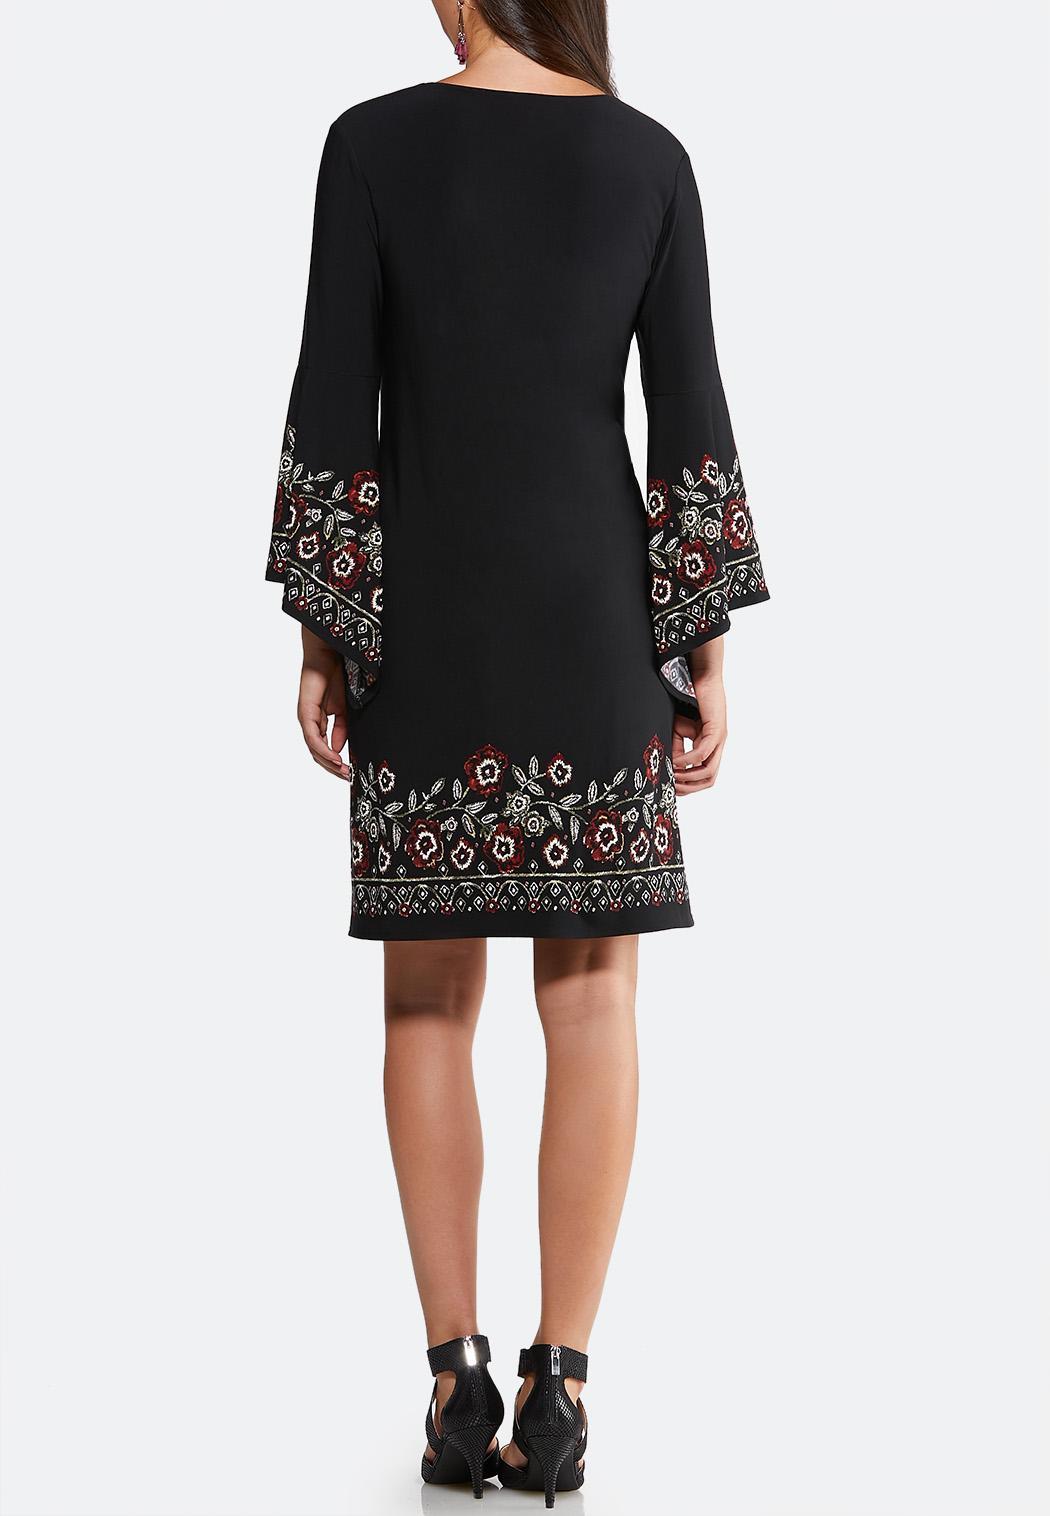 Floral Puff Swing Dress (Item #43947606)